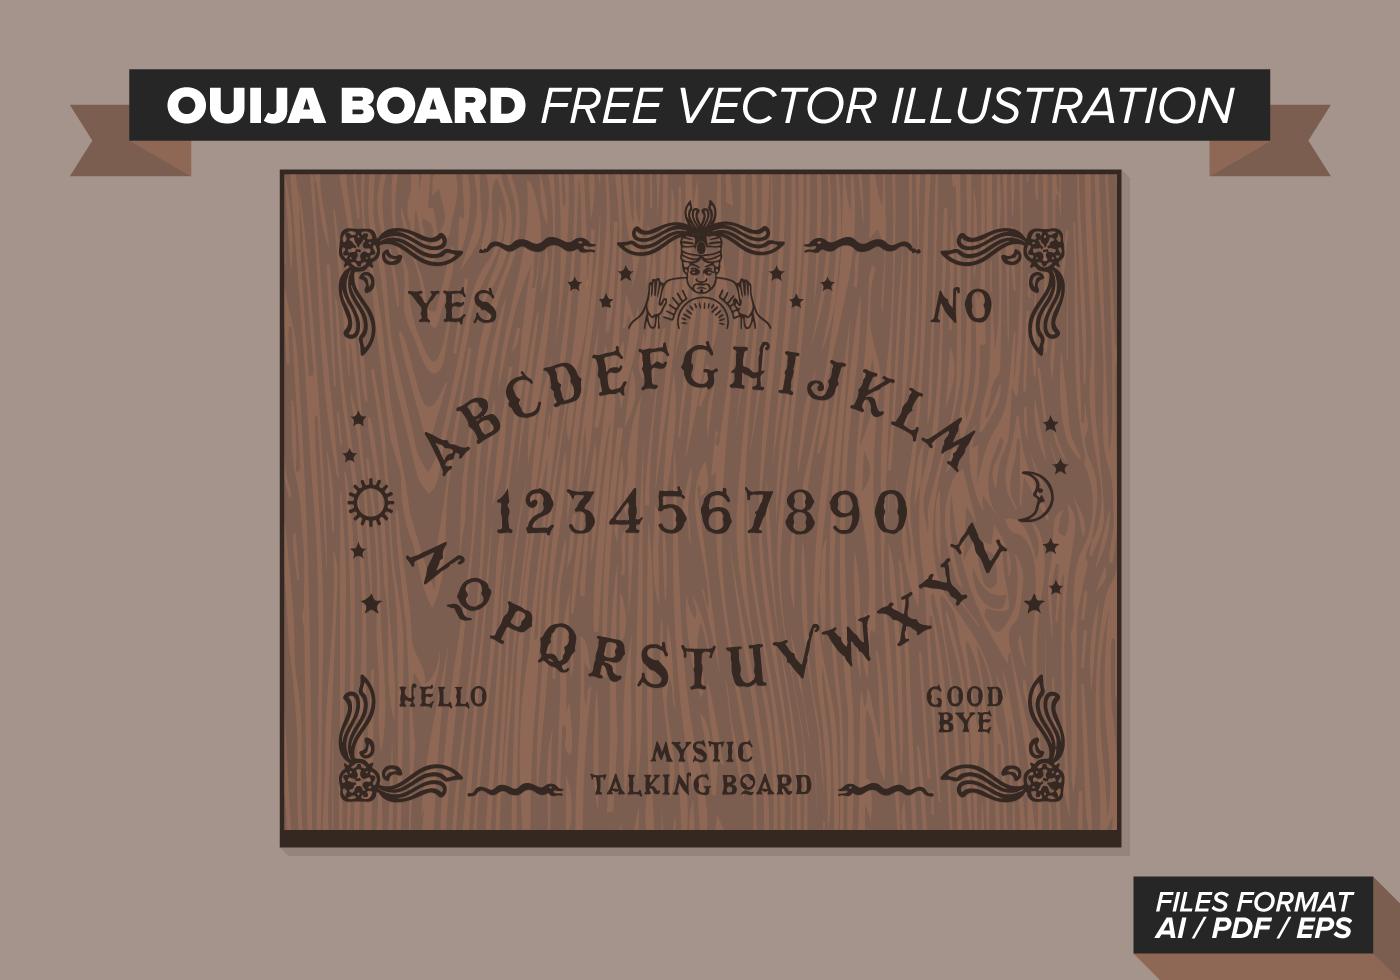 Ouija board free vector illustration vol 3 download free vector ouija board free vector illustration buycottarizona Gallery